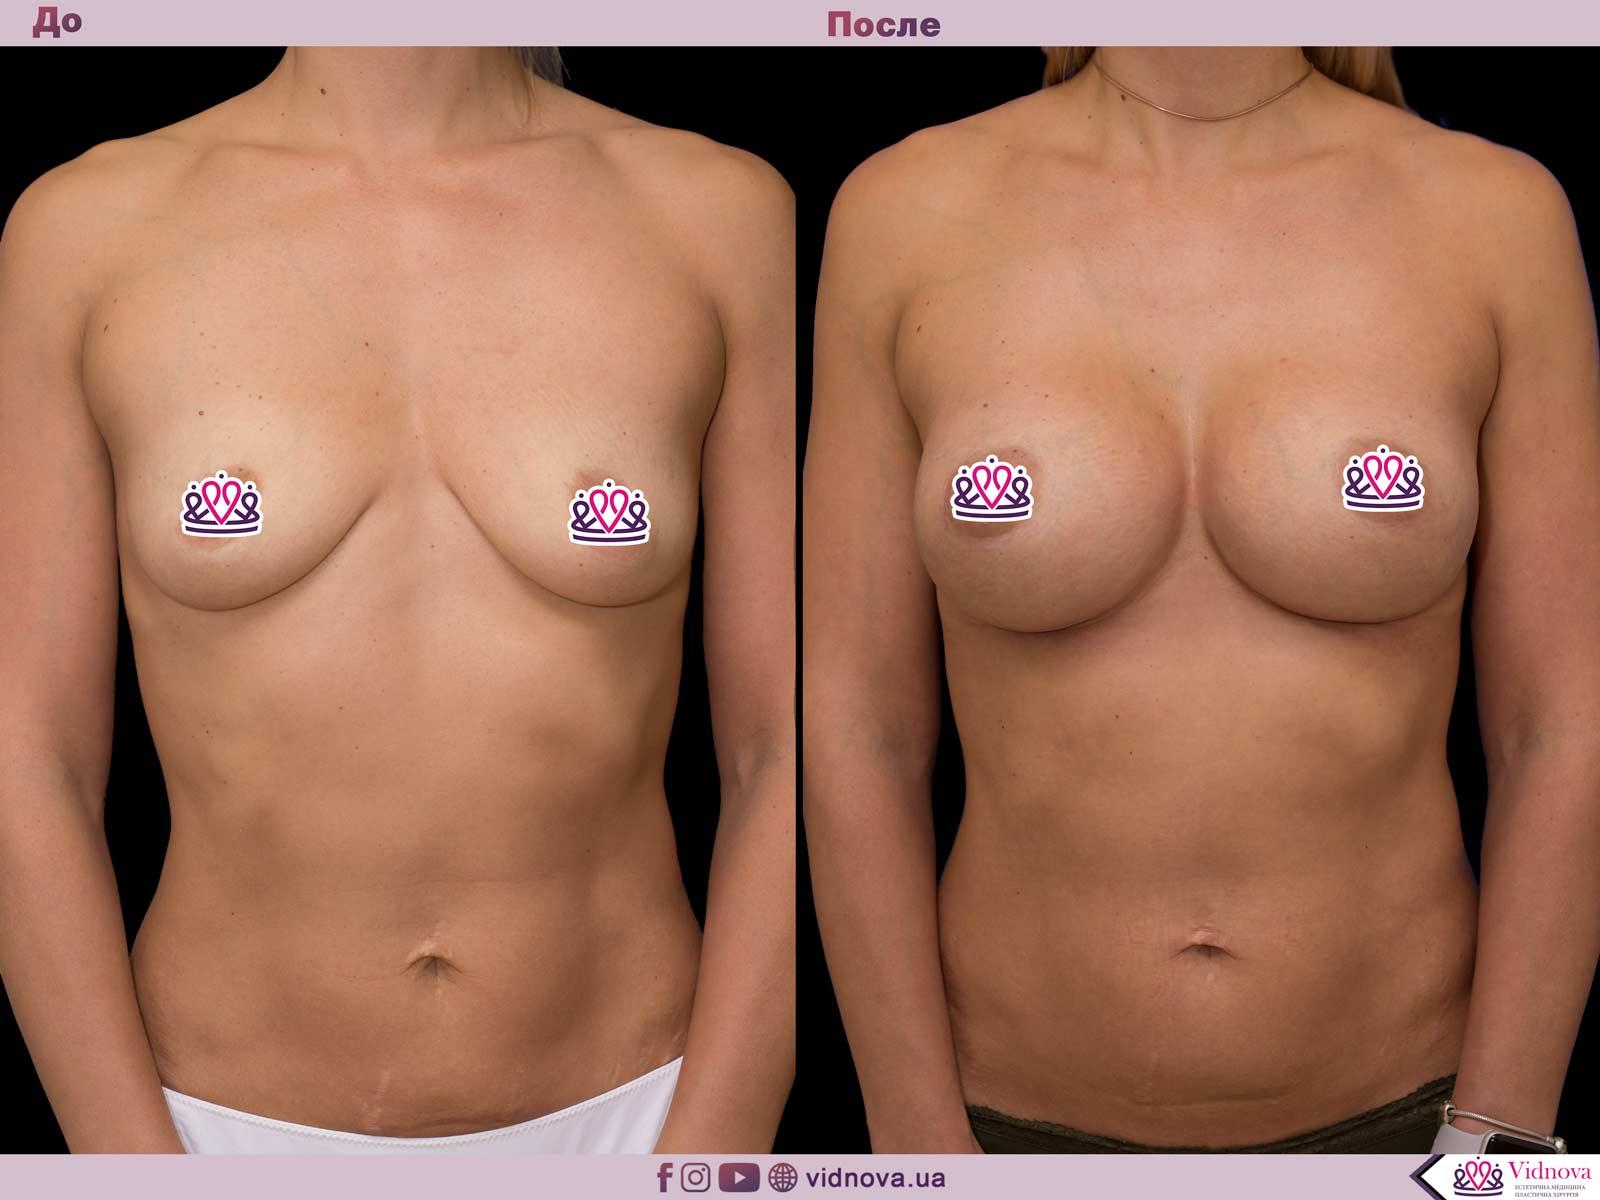 Увеличение груди: Фото ДО и ПОСЛЕ - Пример №35-1 - Клиника Vidnova